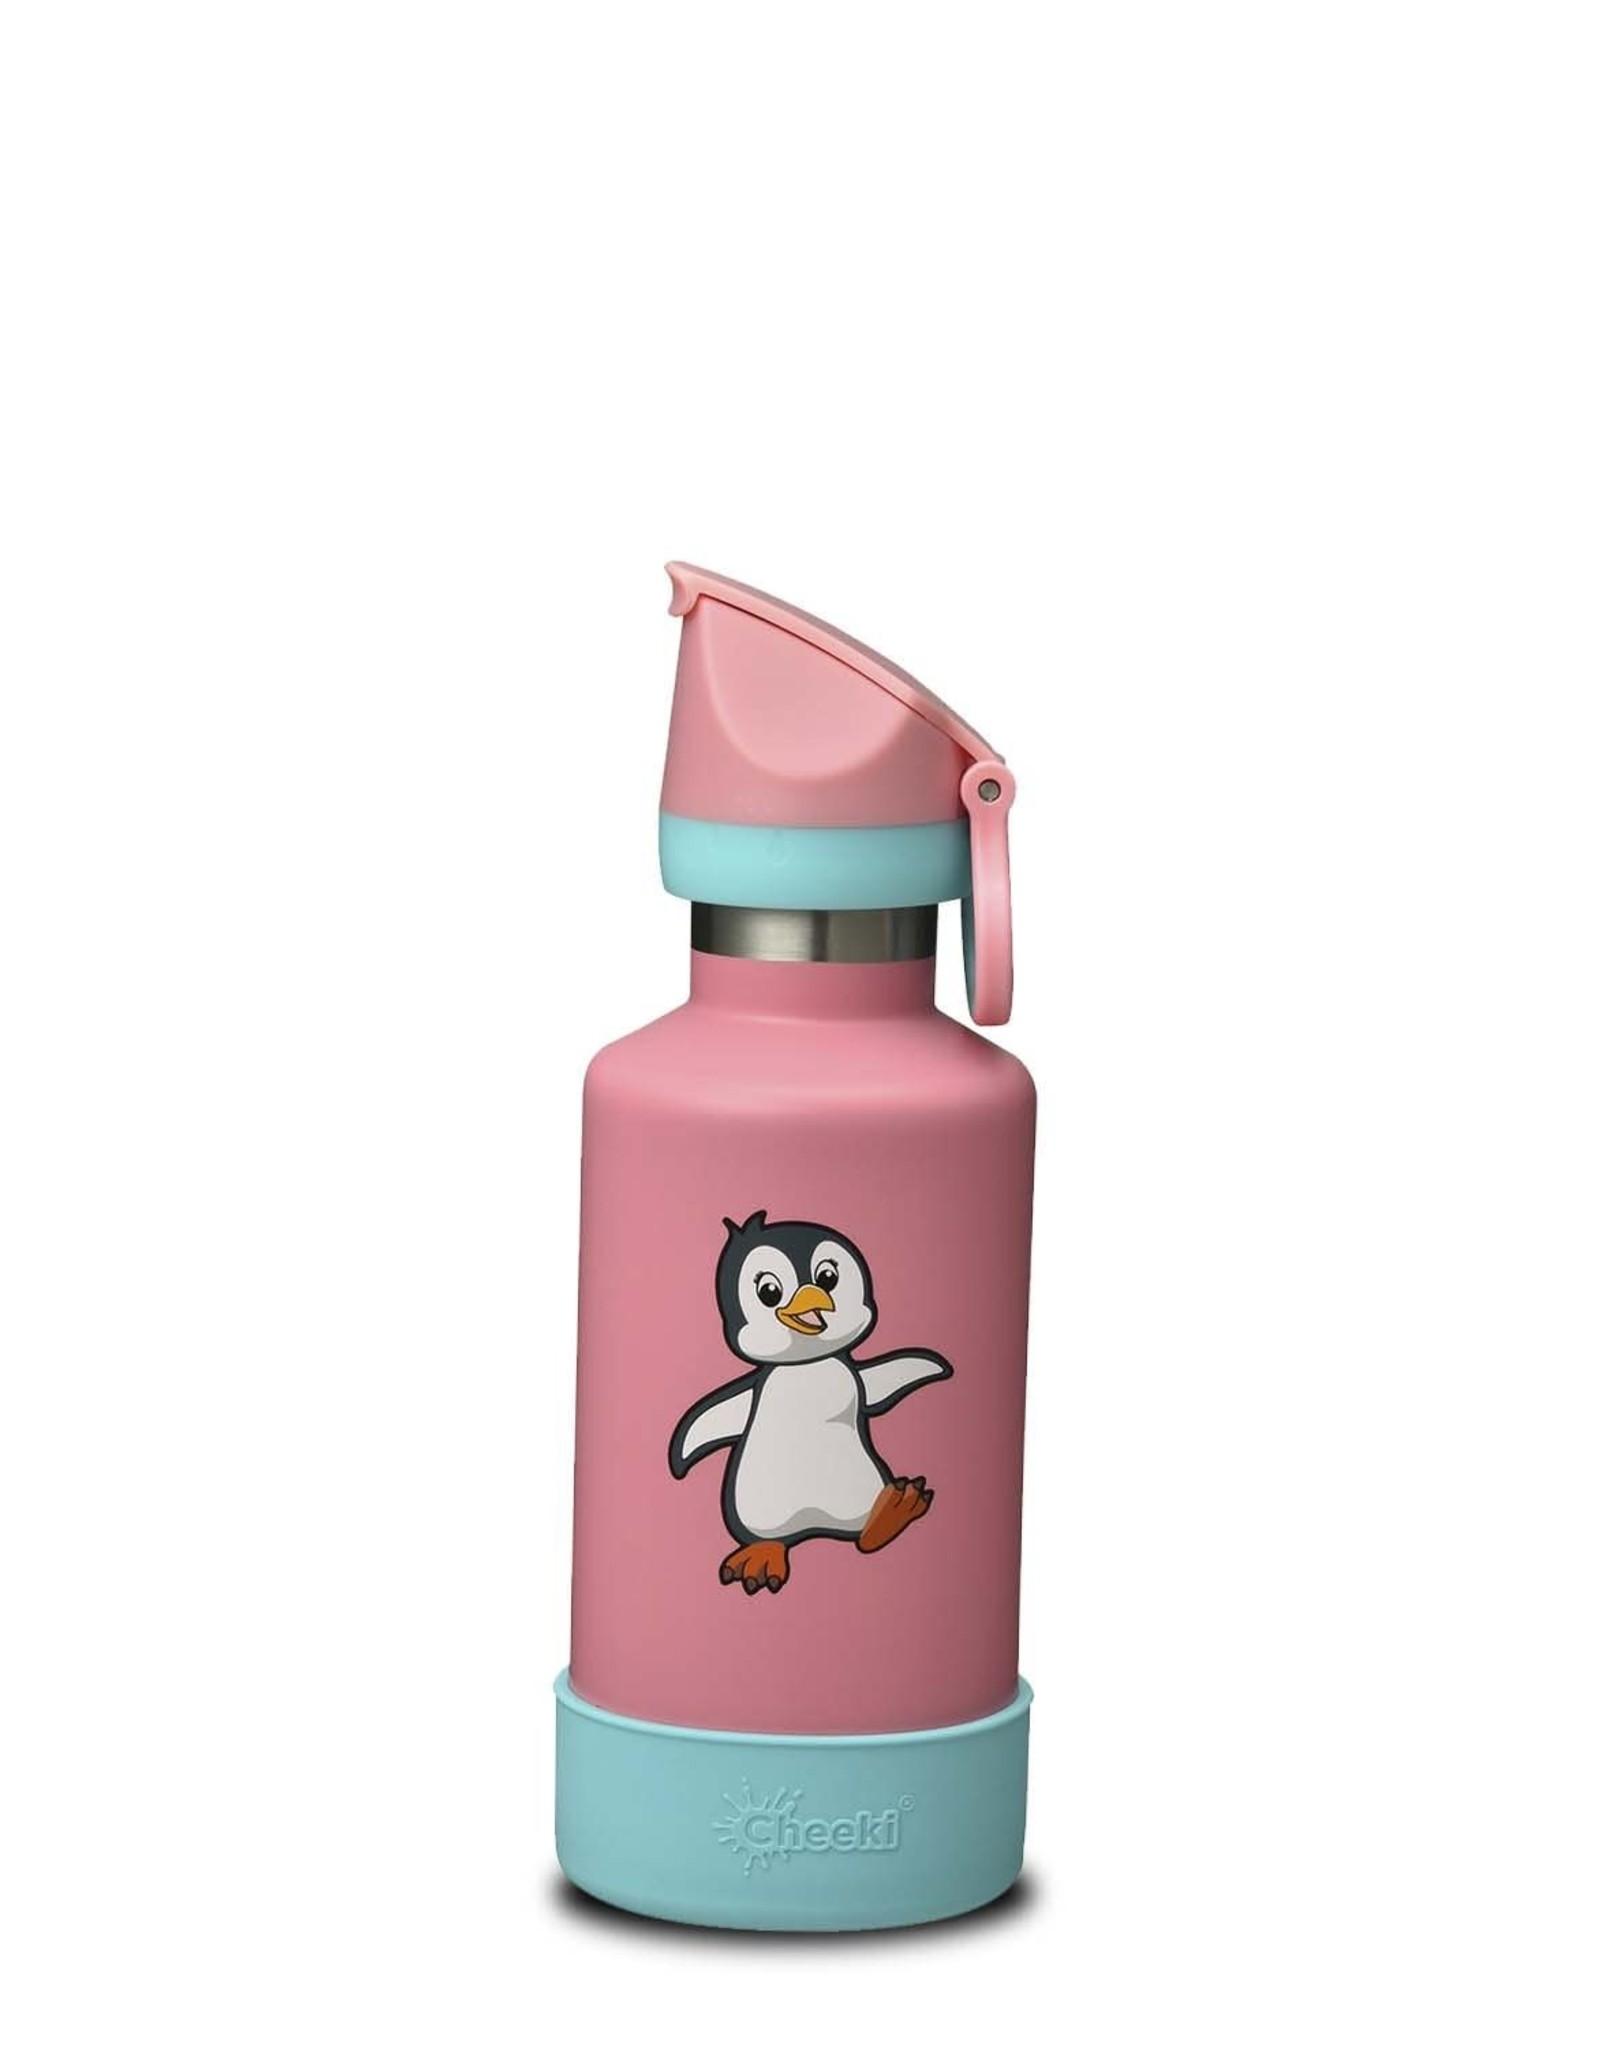 Cheeki Kids Bottle - Insulated - 400ml